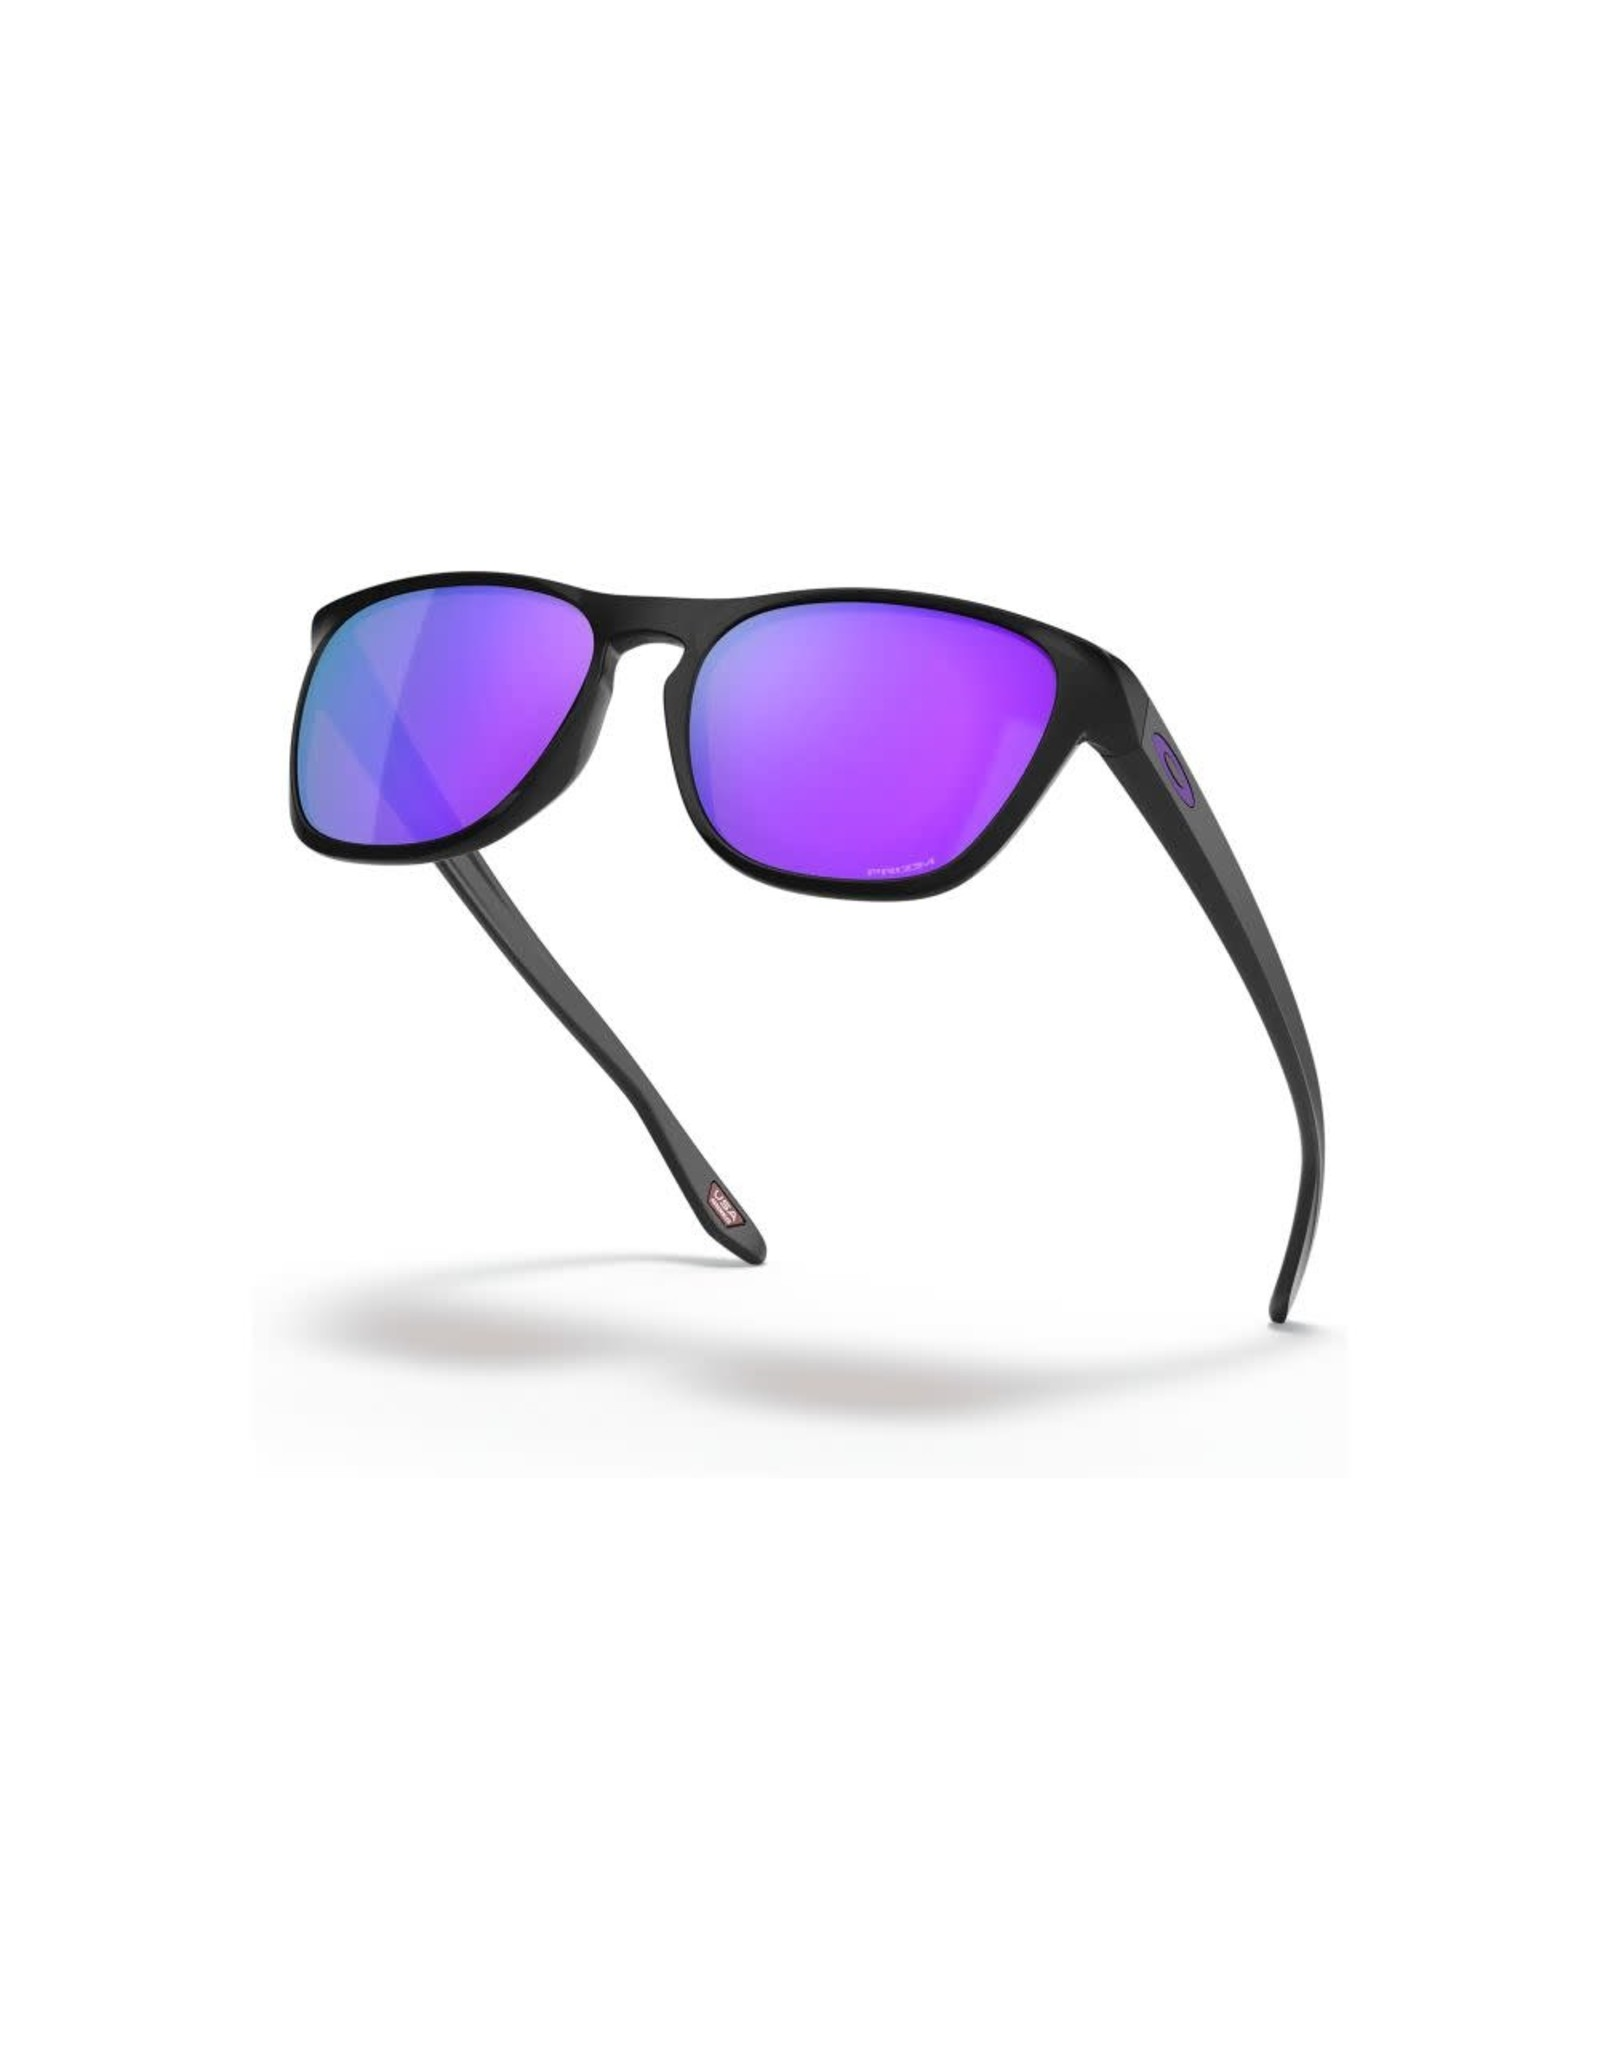 OAKLEY Oakley Manorburn lunette matte noir prizm violet